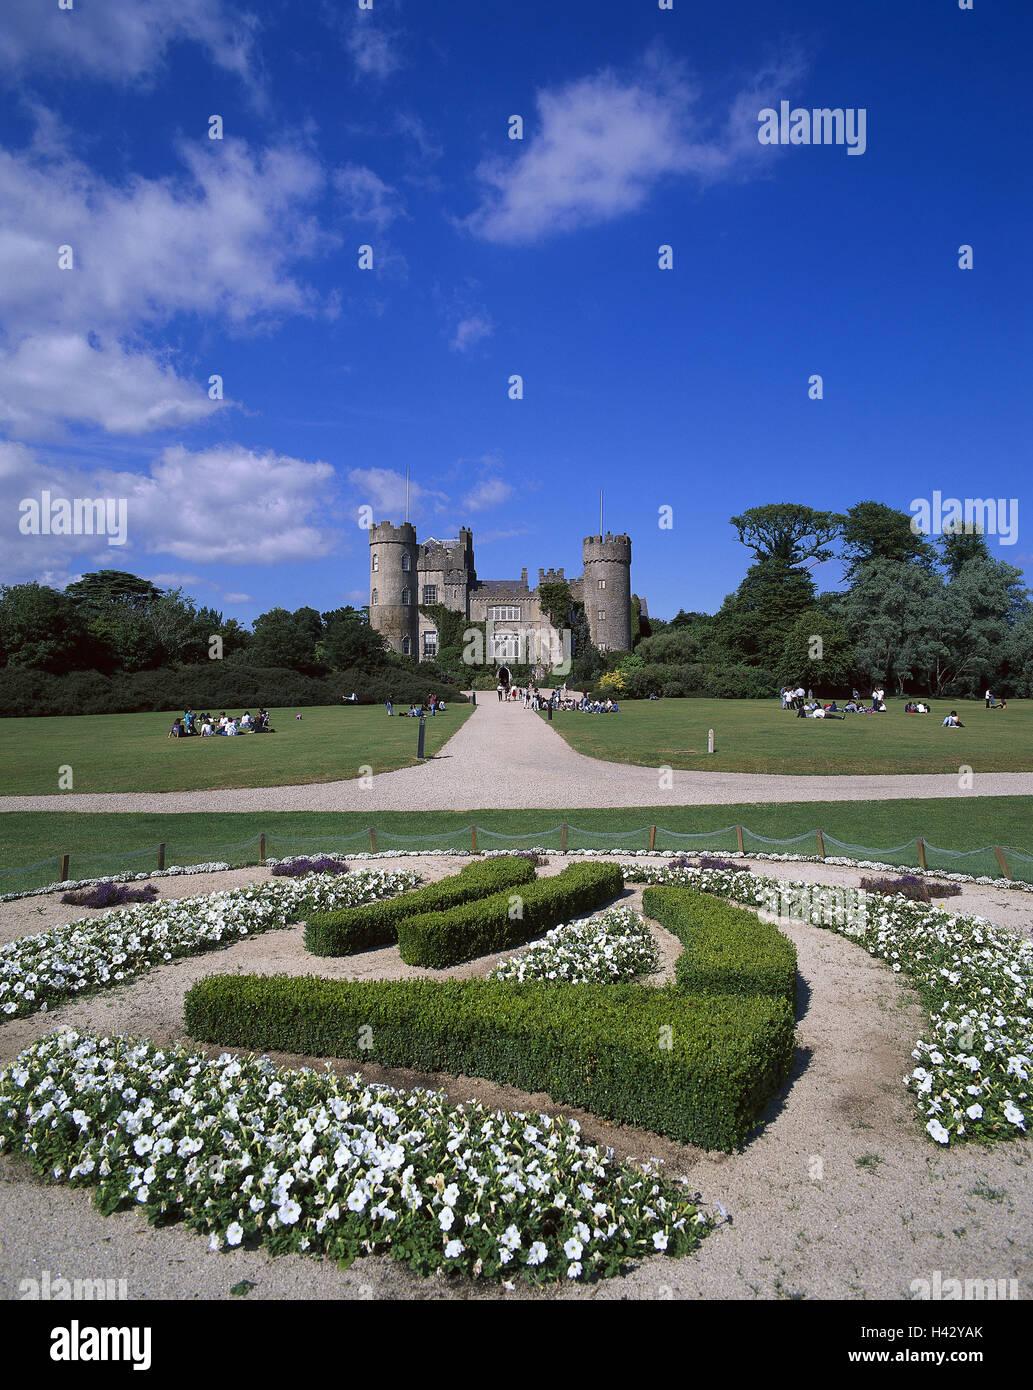 Ireland, Dublin, Malahide Castle, castle grounds, flowerbeds, tourists, Europe, Irishman's country, lock, castle - Stock Image